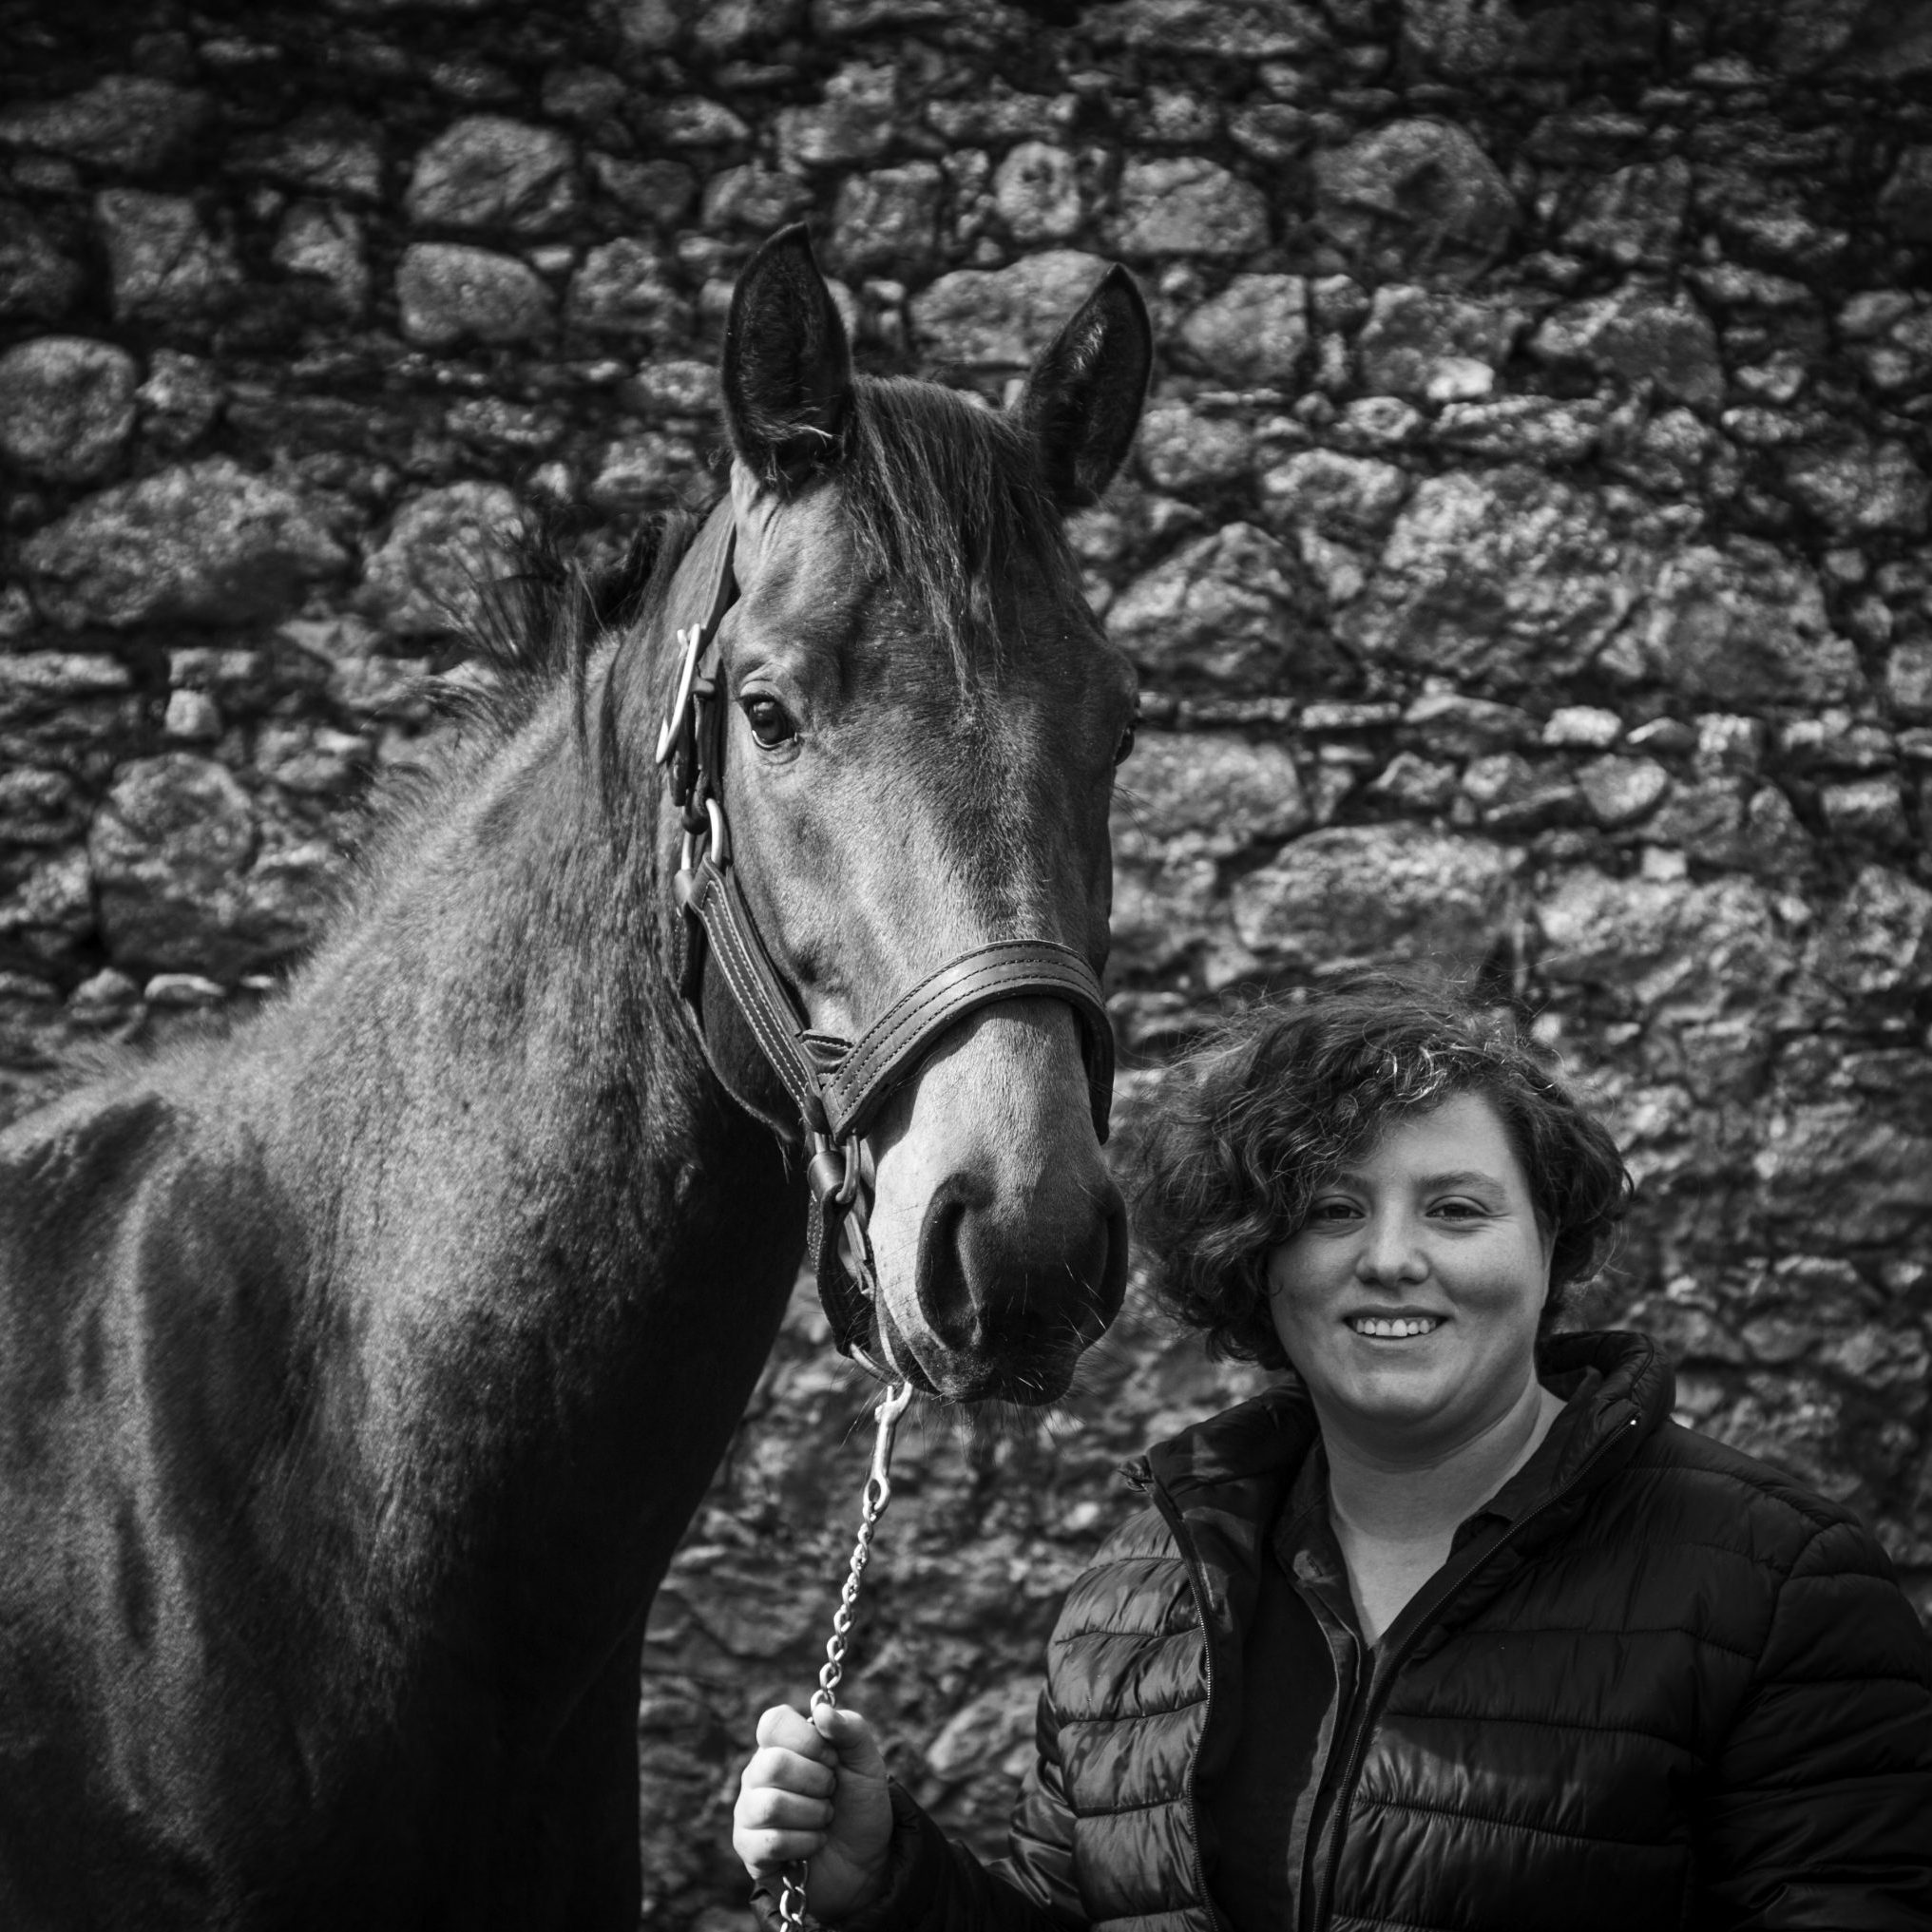 Working-Farm-Ireland-Studfarm-Groom-Rider-Staff-Internship